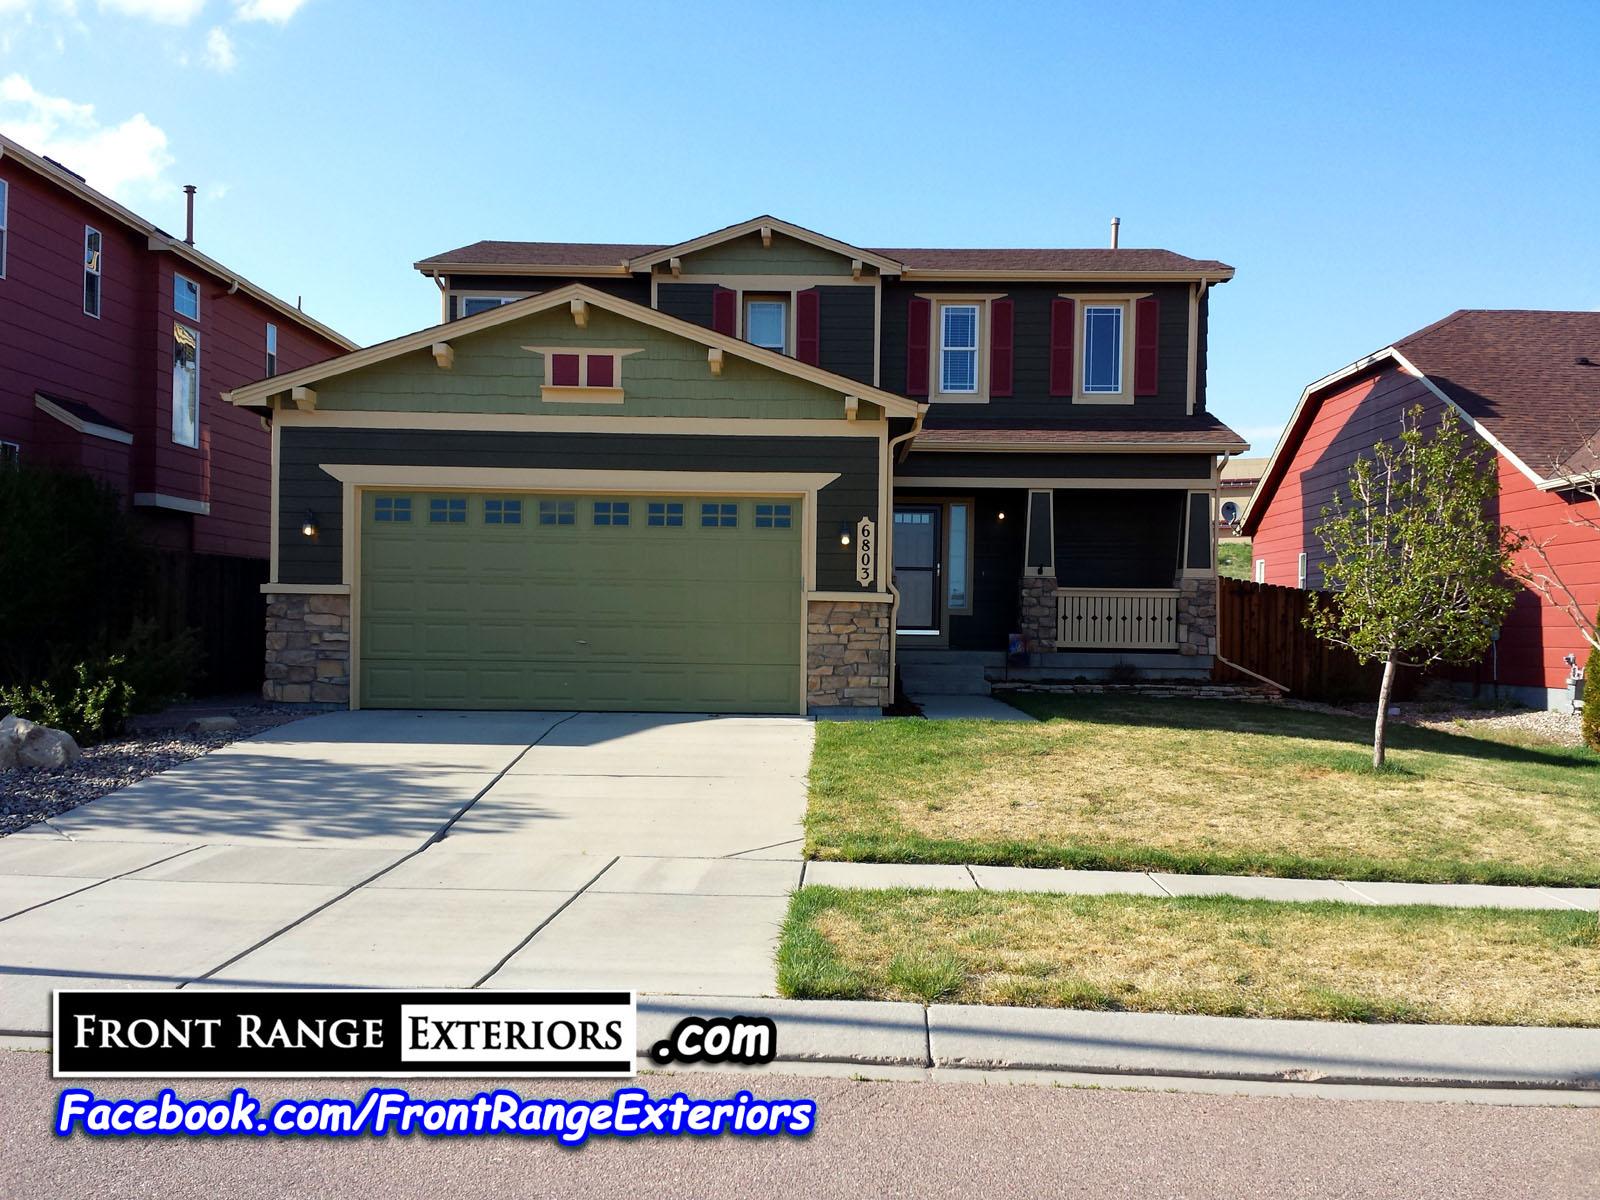 Colorado Springs House Painter 80920 Front Range Exteriors Inc